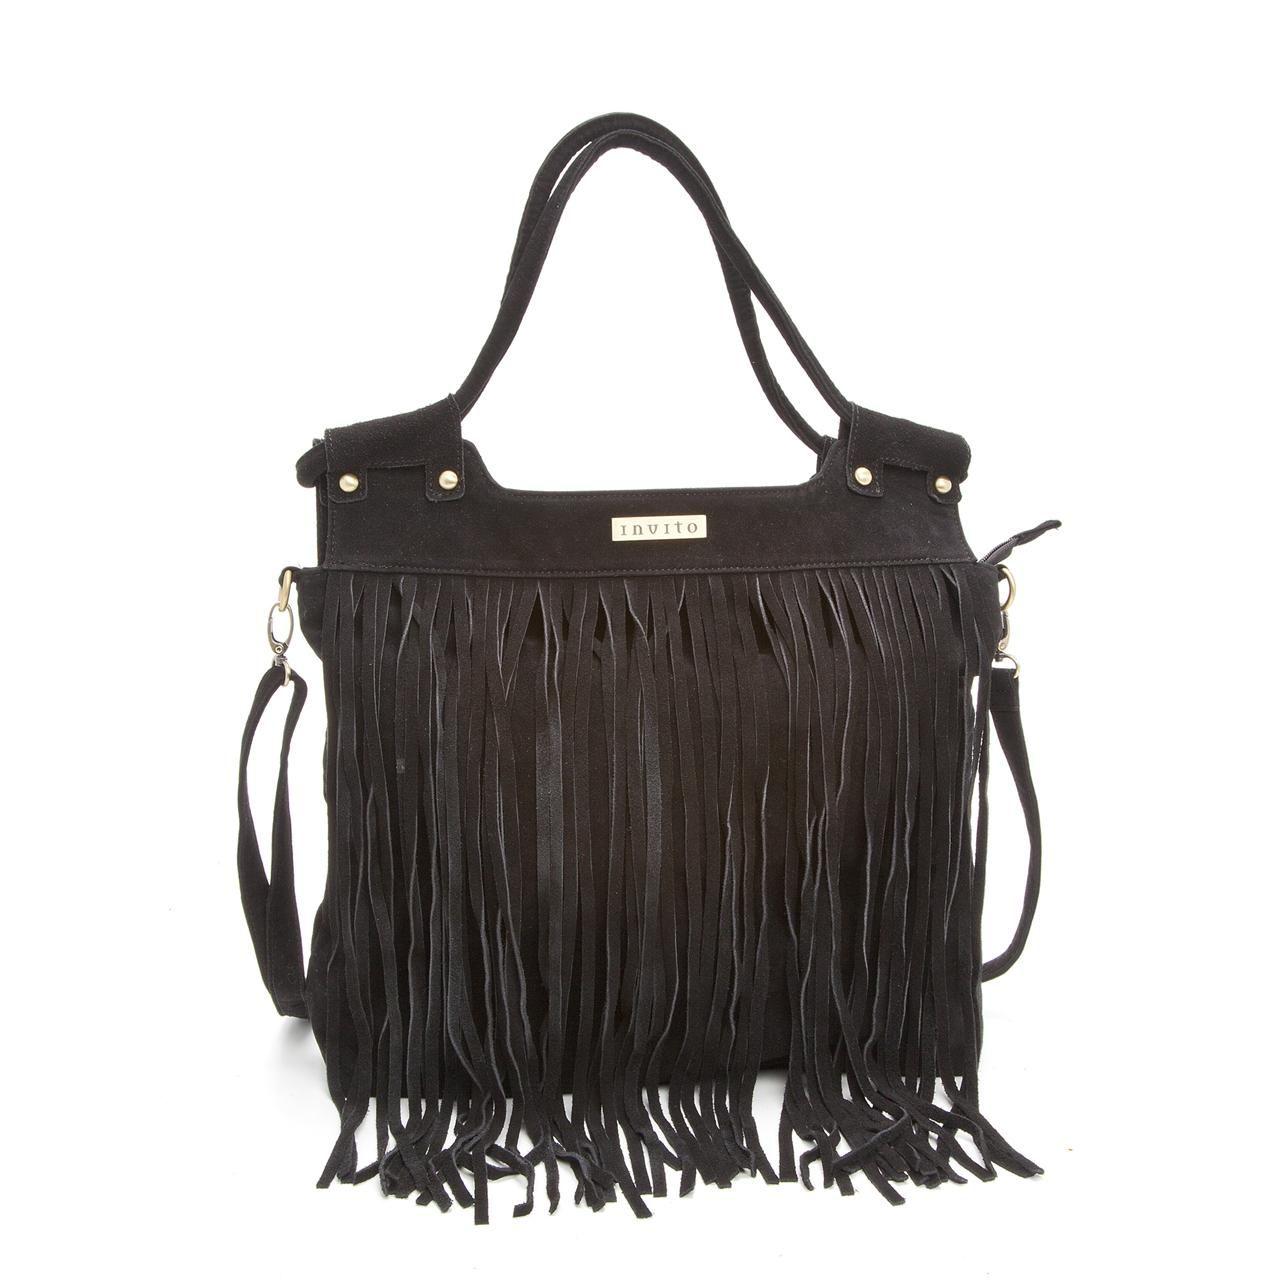 FranjesBags Zwarte Invito Met Tas Bag AccessoriesEn Y7yvfg6b